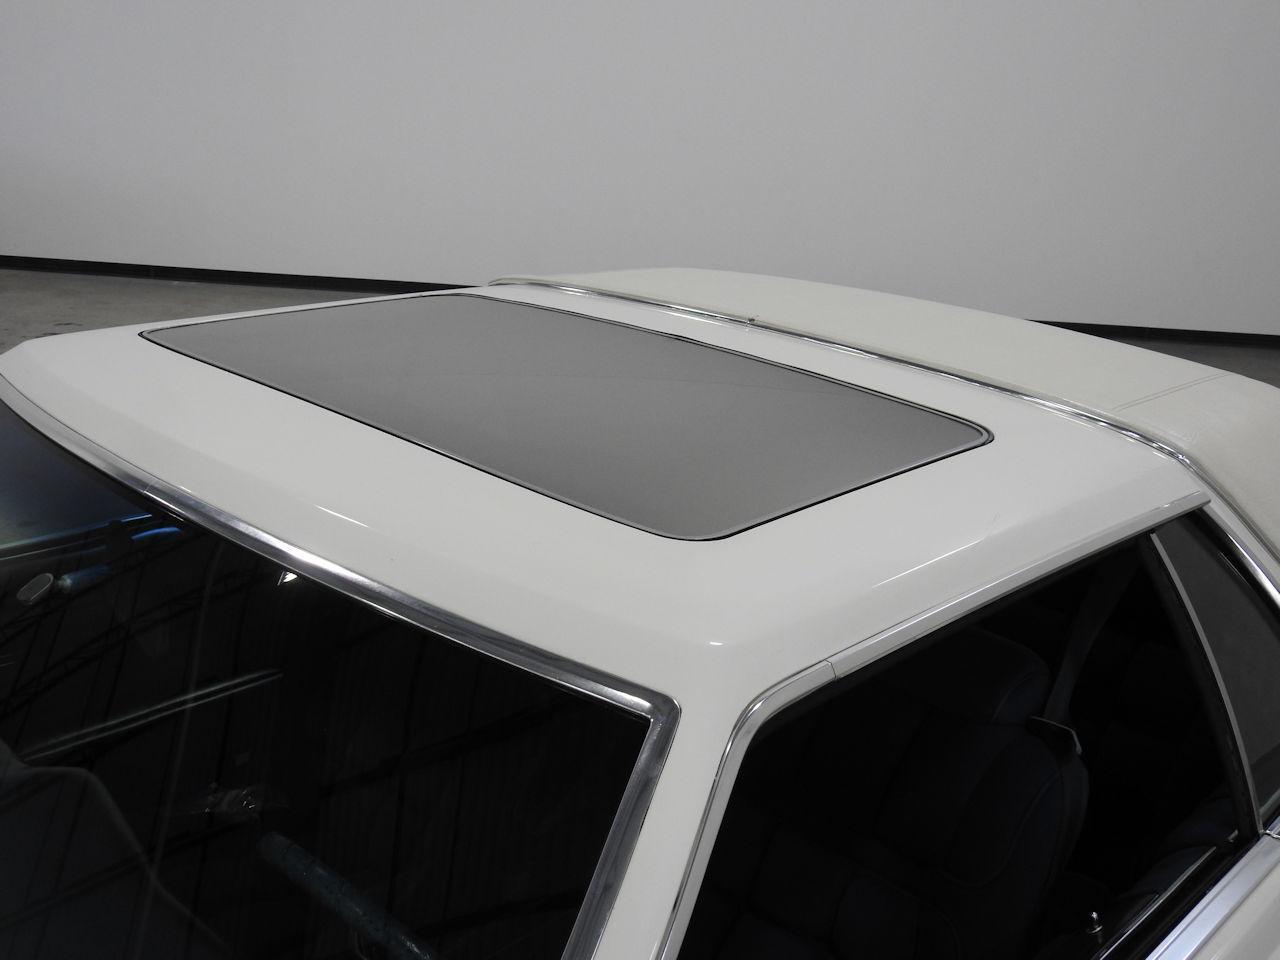 1979 Lincoln MKV 8